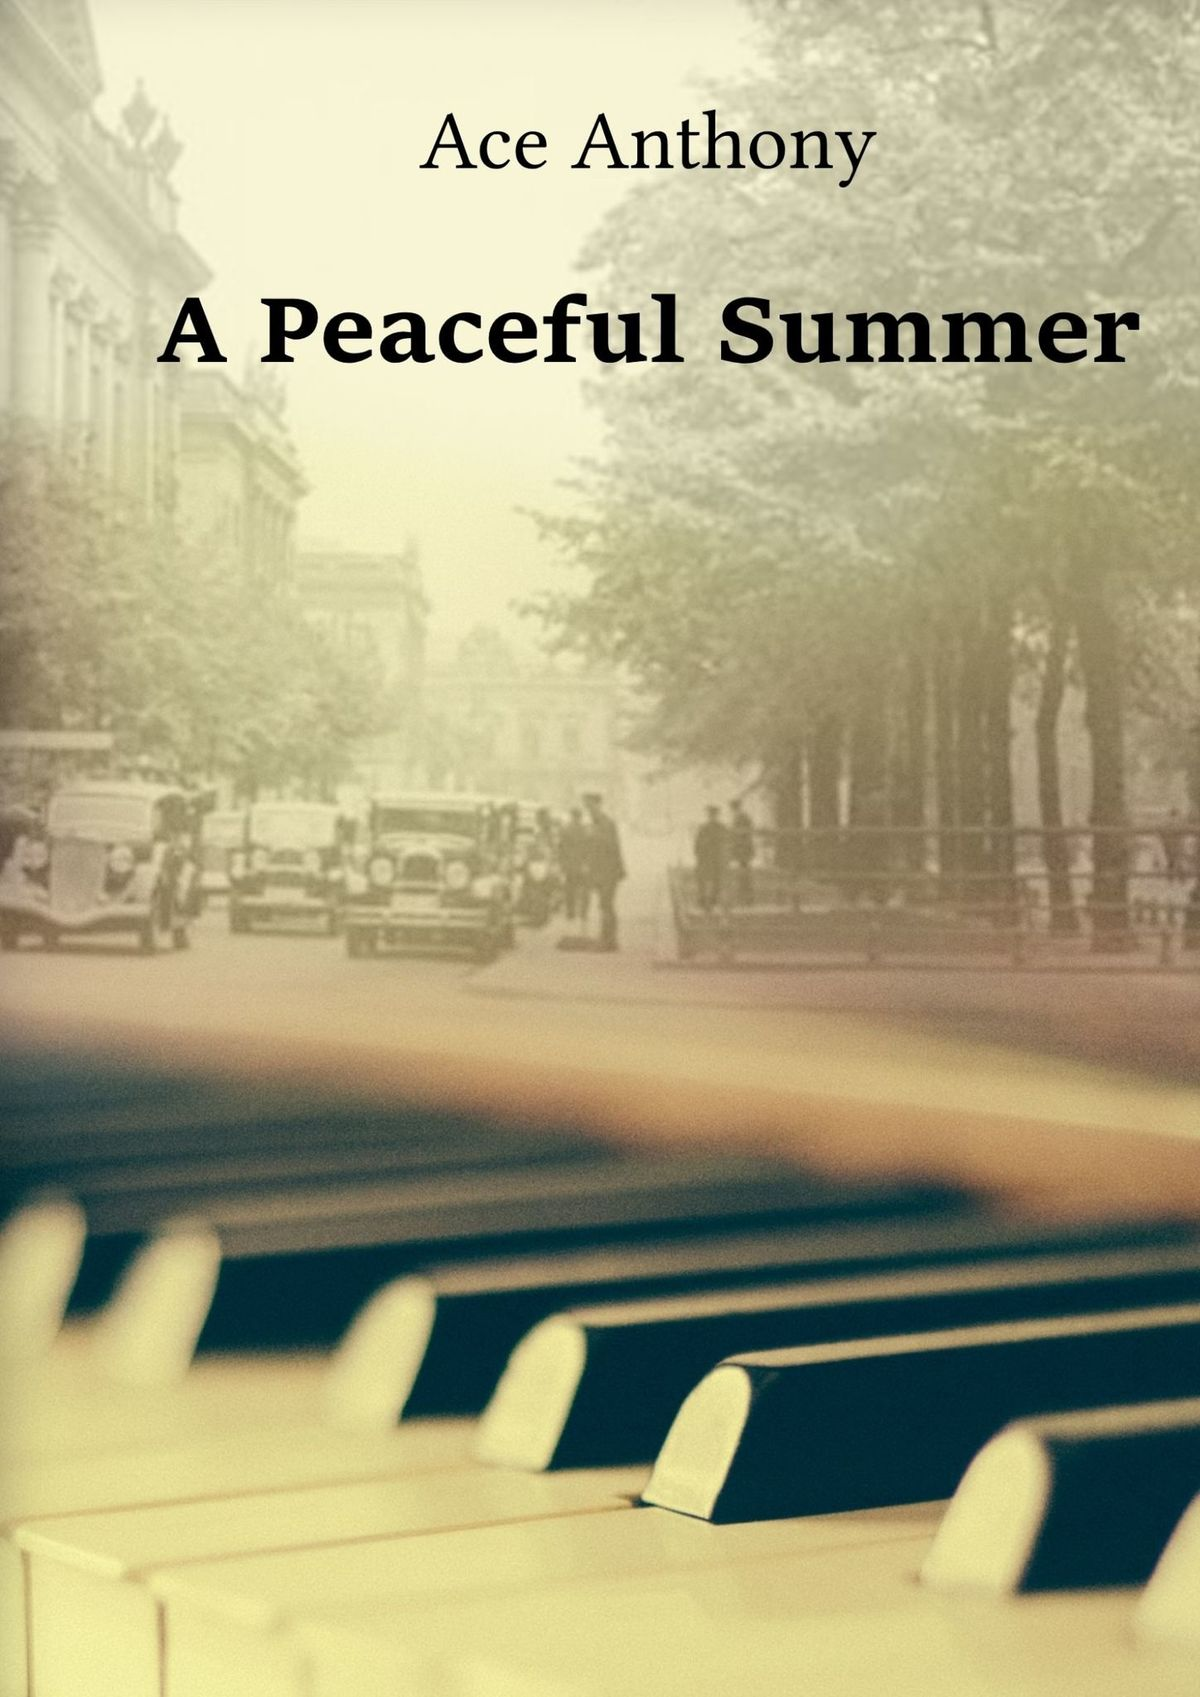 APeaceful Summer